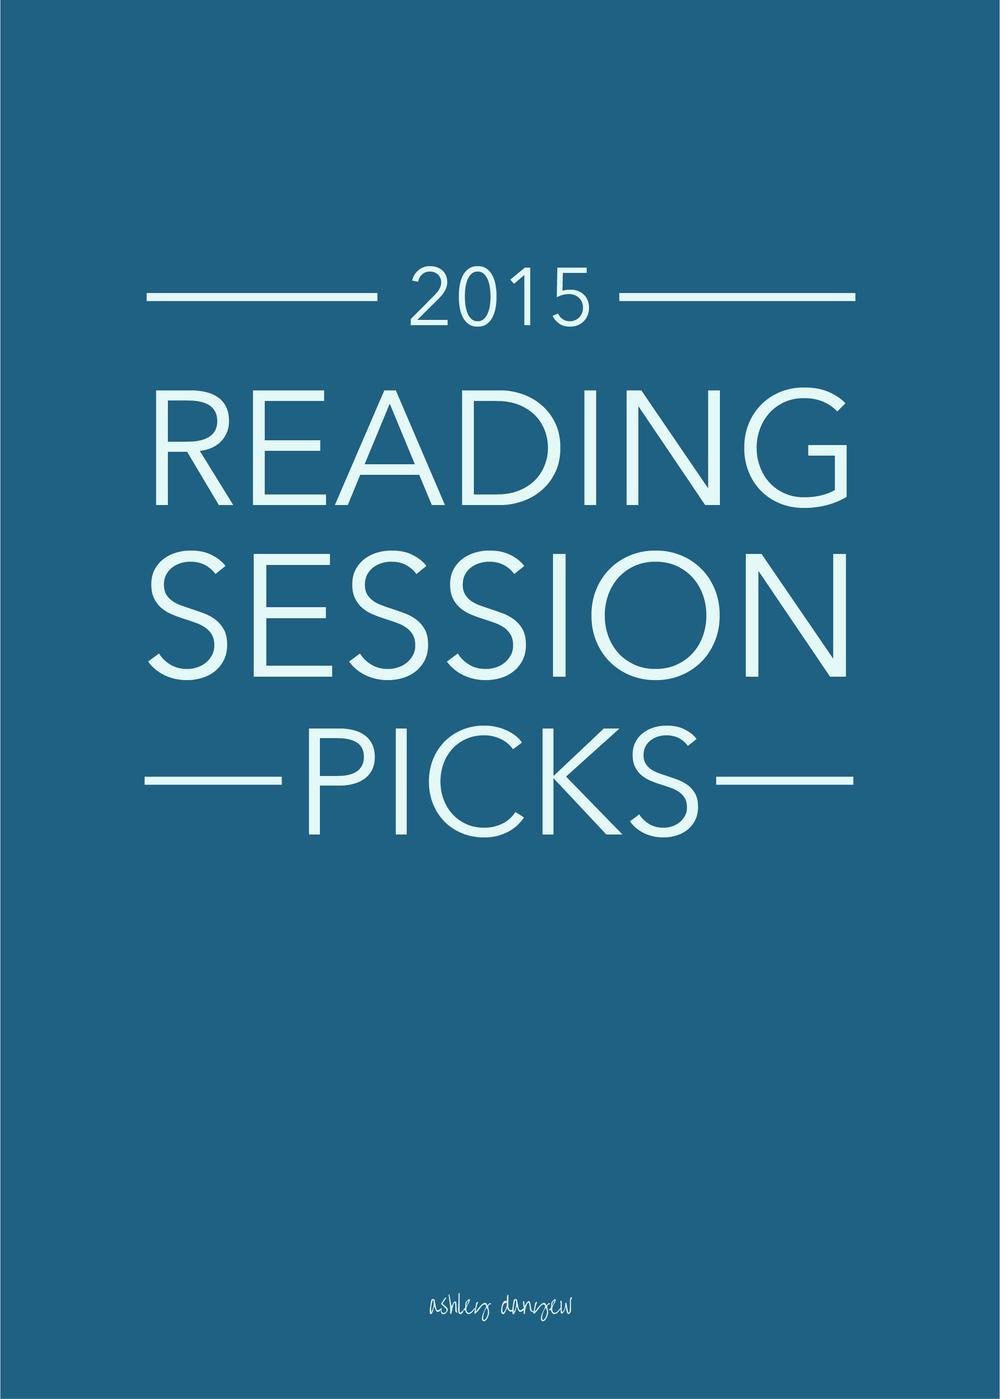 Copy of 2015 Reading Session Picks